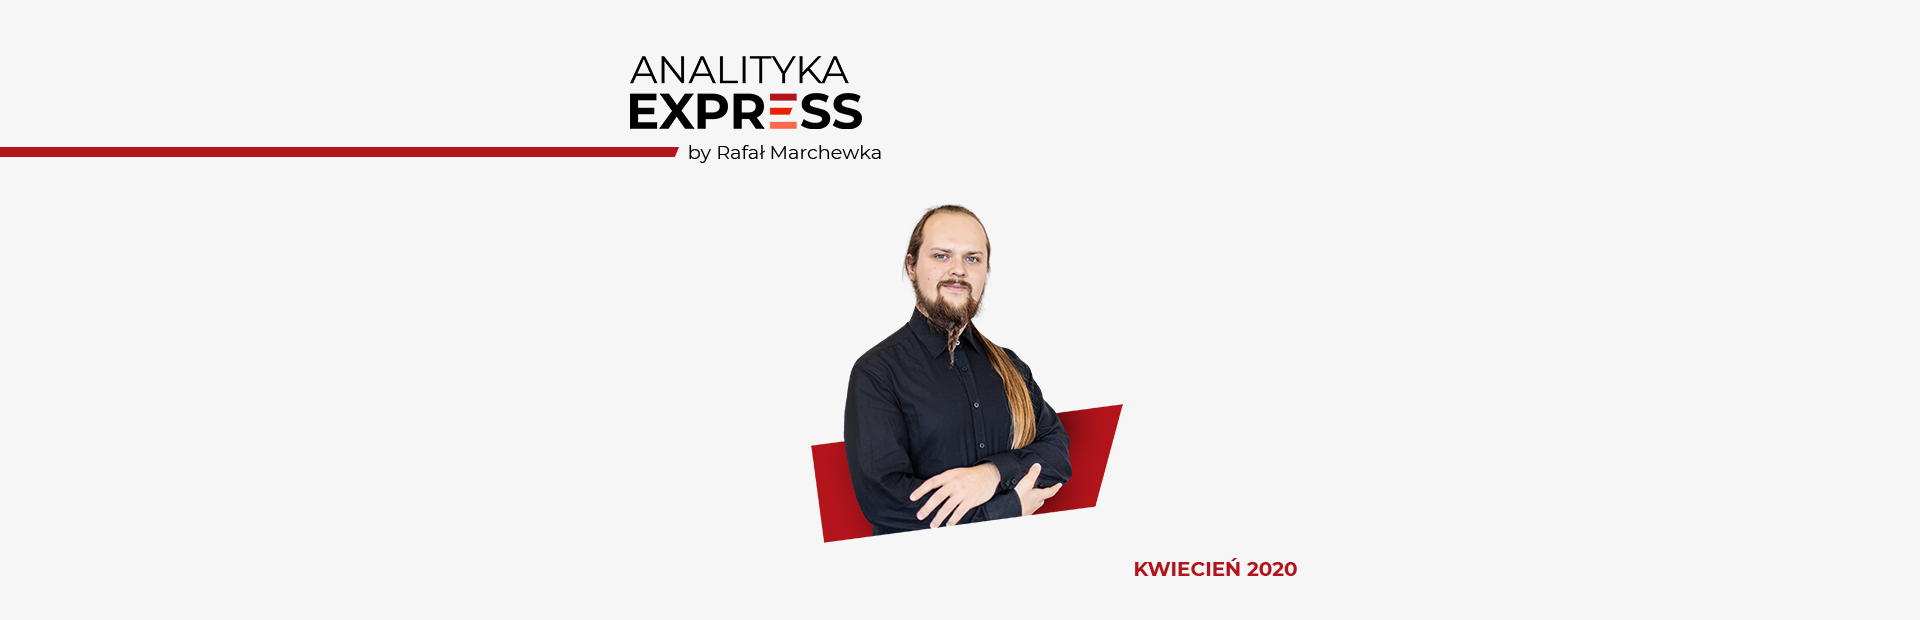 Analityka Express 4/2020